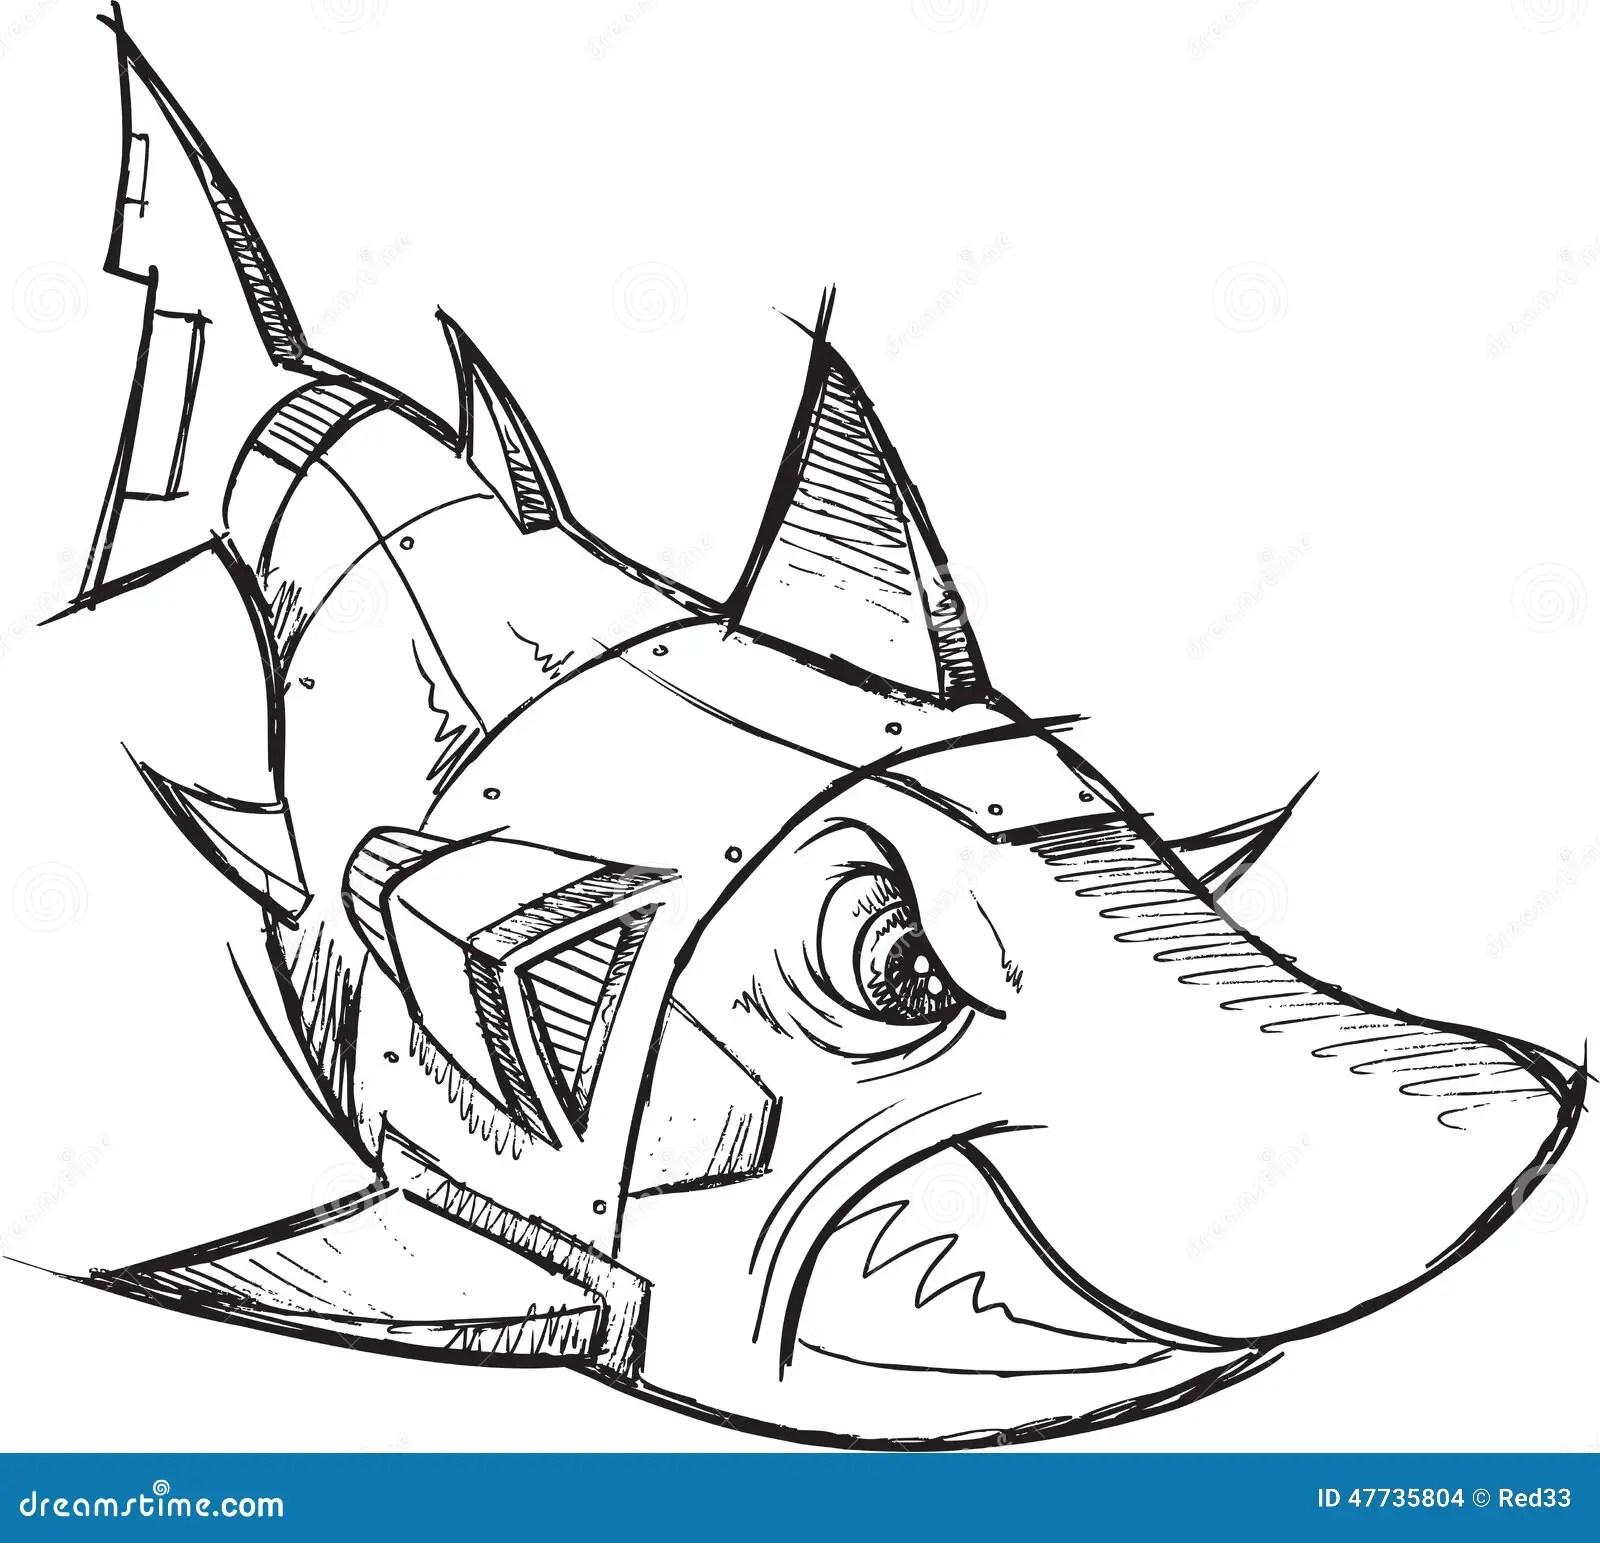 Cyborg Robot Shark Sketch Stock Vector